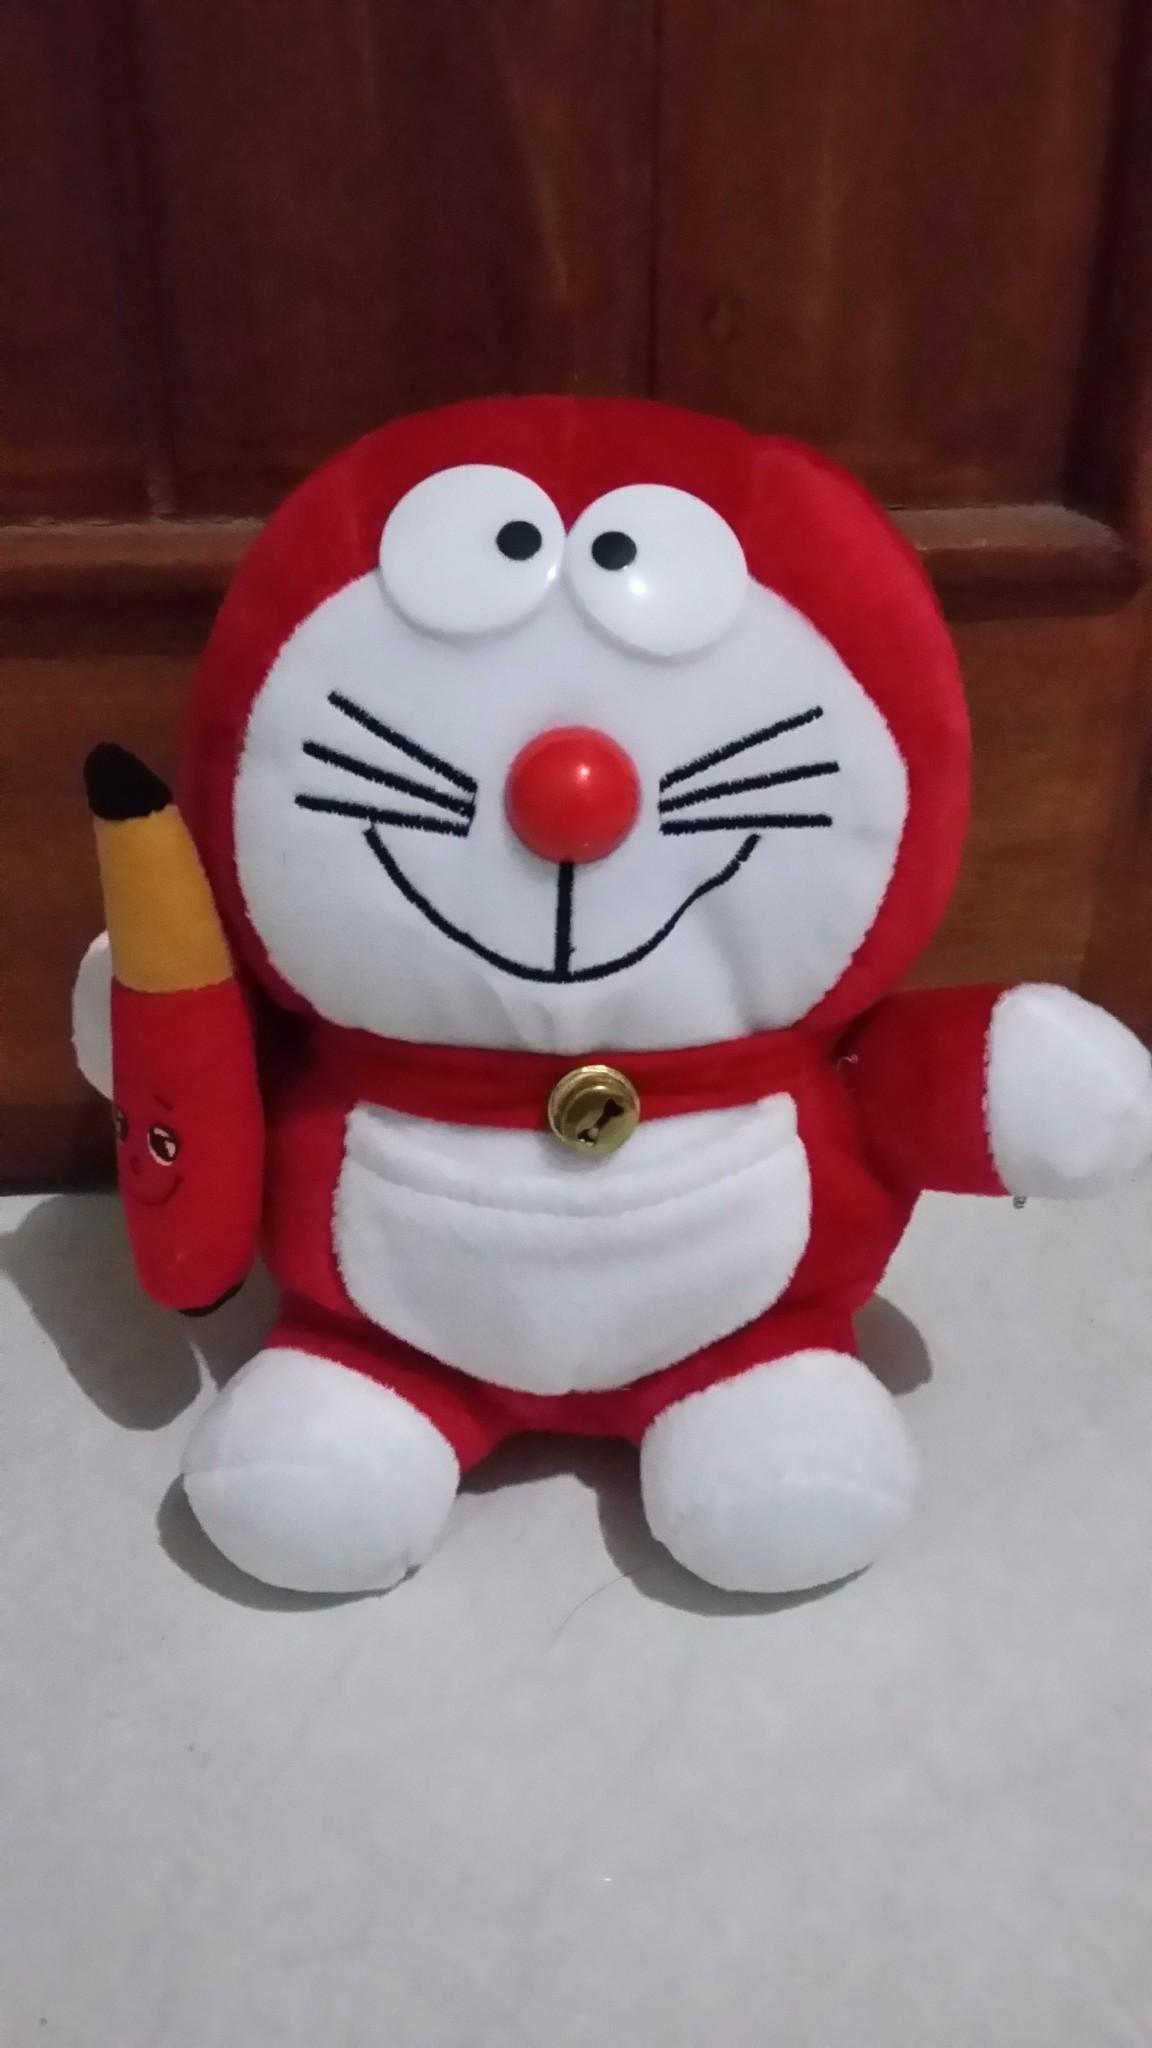 Jual Boneka Doraemon Warna Merah Acha Bookstore Tokopedia Maainan Doraemoon Kyutt